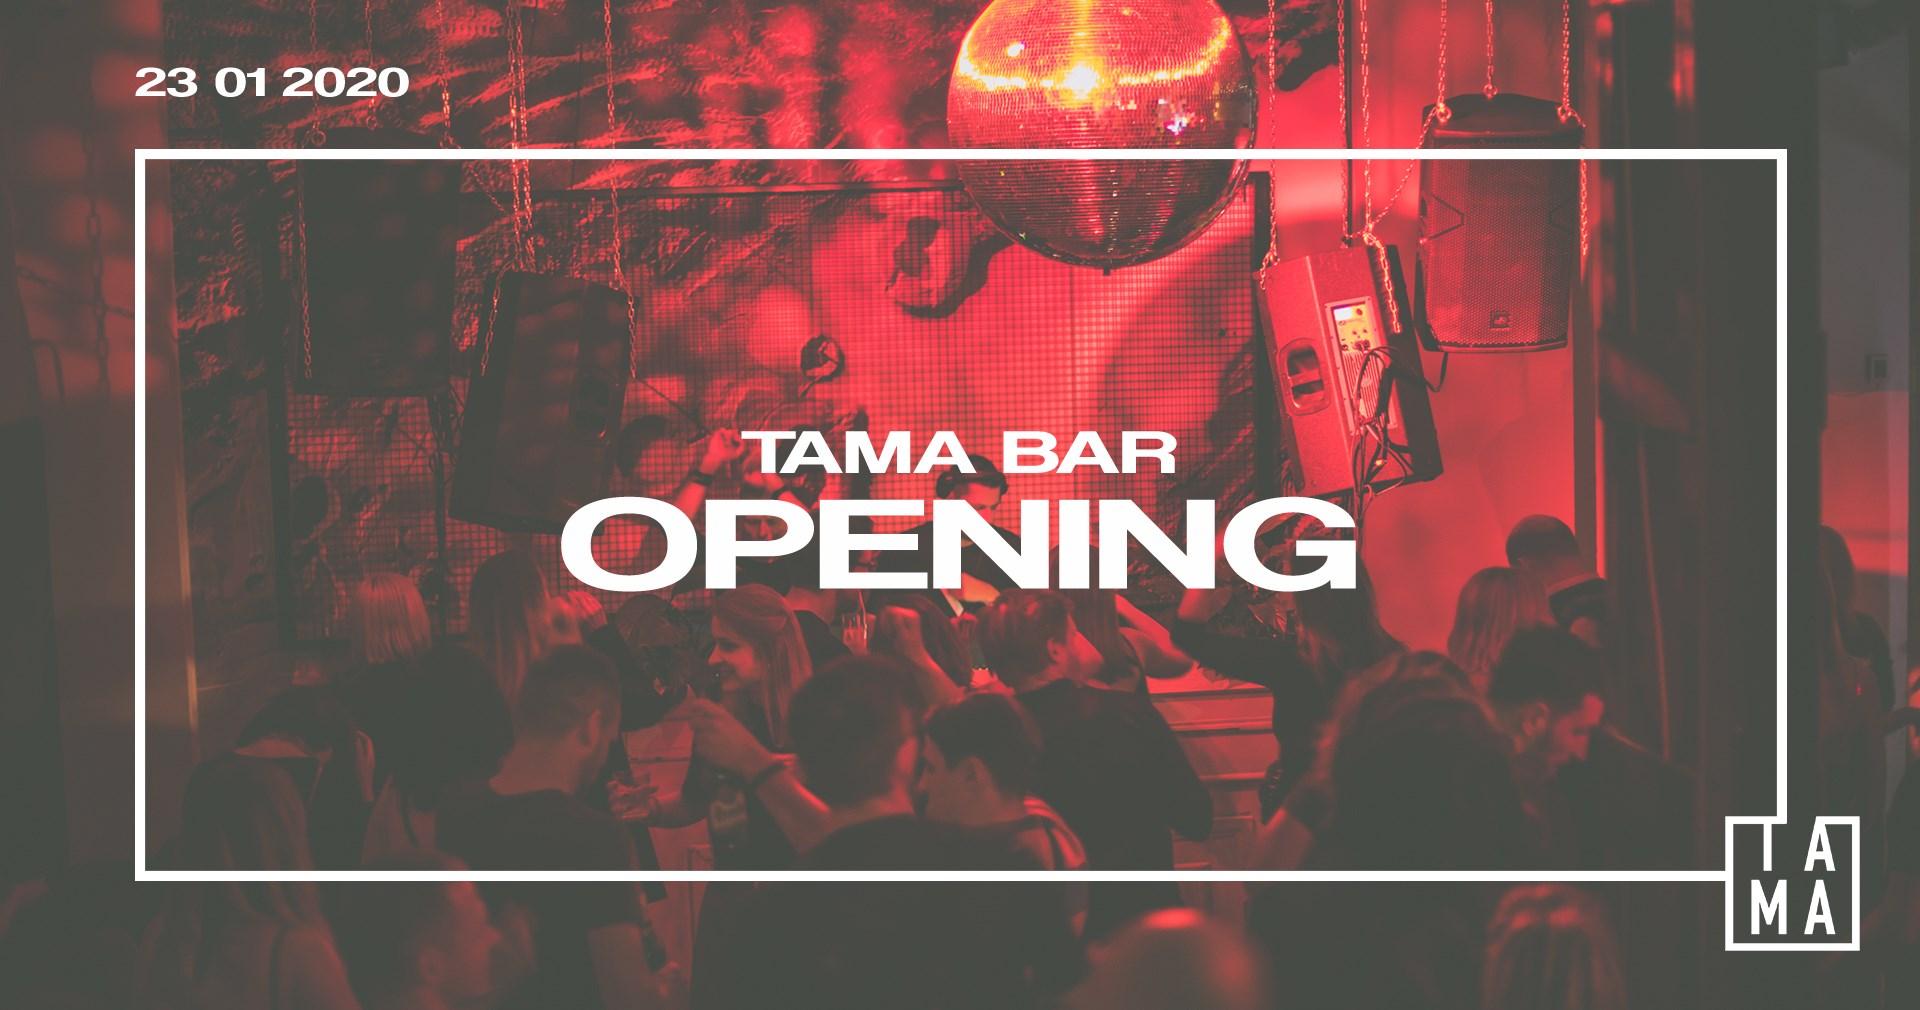 Tama Bar Opening